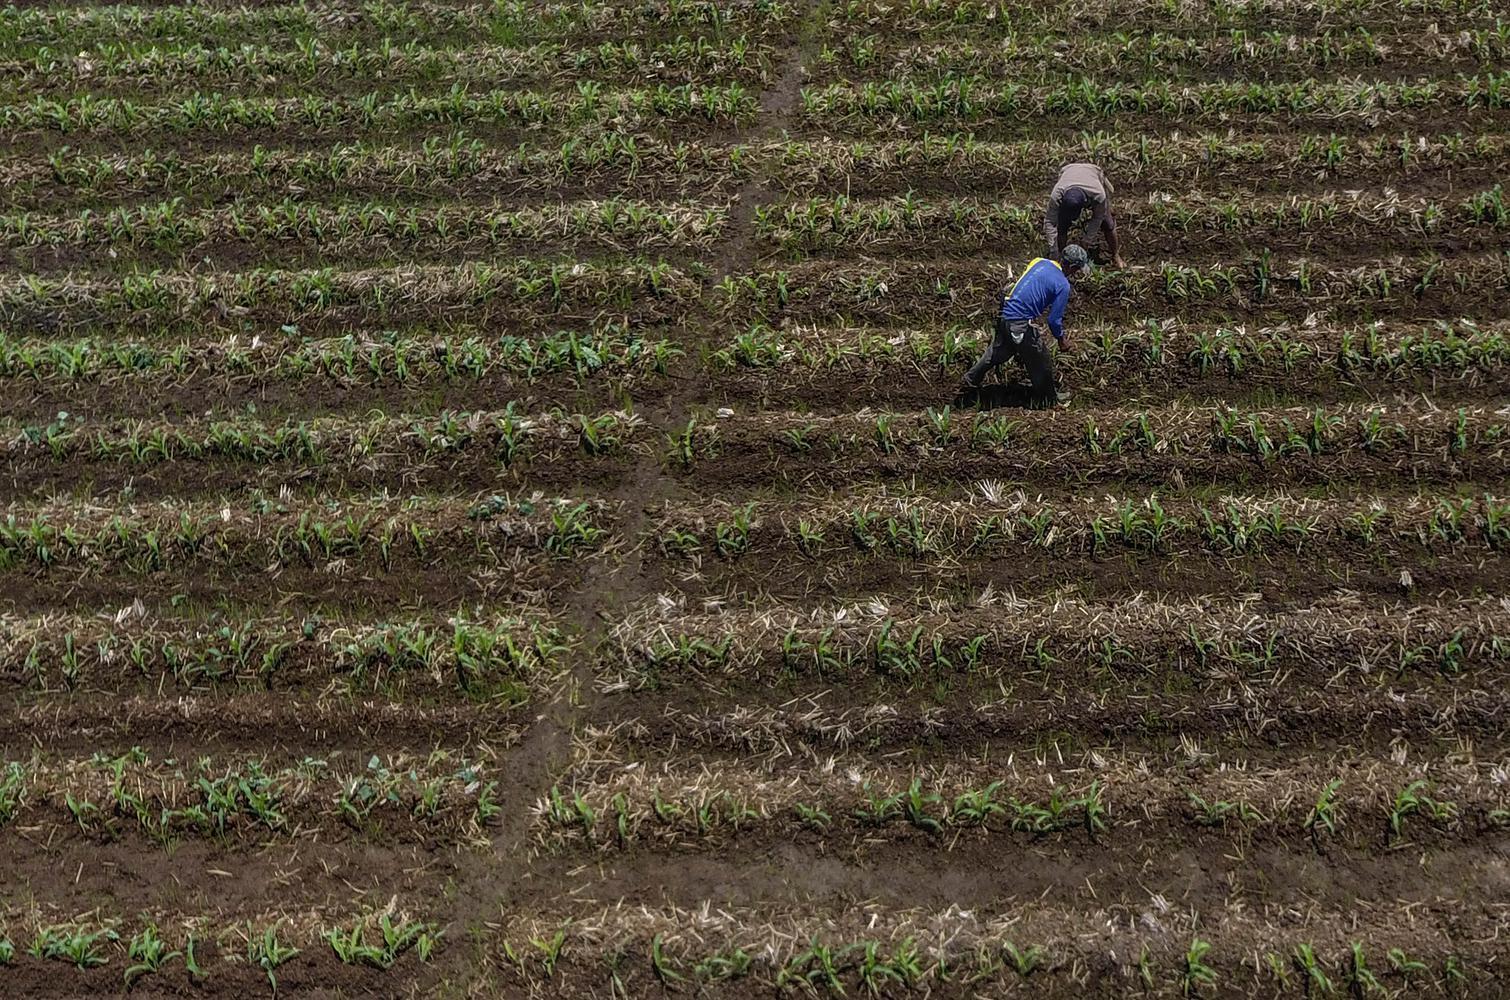 Foto udara petani menggarap sawah yang mengering di Desa Sukamenak, Kabupaten Tasikmalaya, Jawa Barat, Selasa (8/10/2019). Kementerian Pertanian (Kementan) menyebutkan luas lahan yang gagal panen atau puso akibat kekeringan mencapai 9.358 hektare yang ter